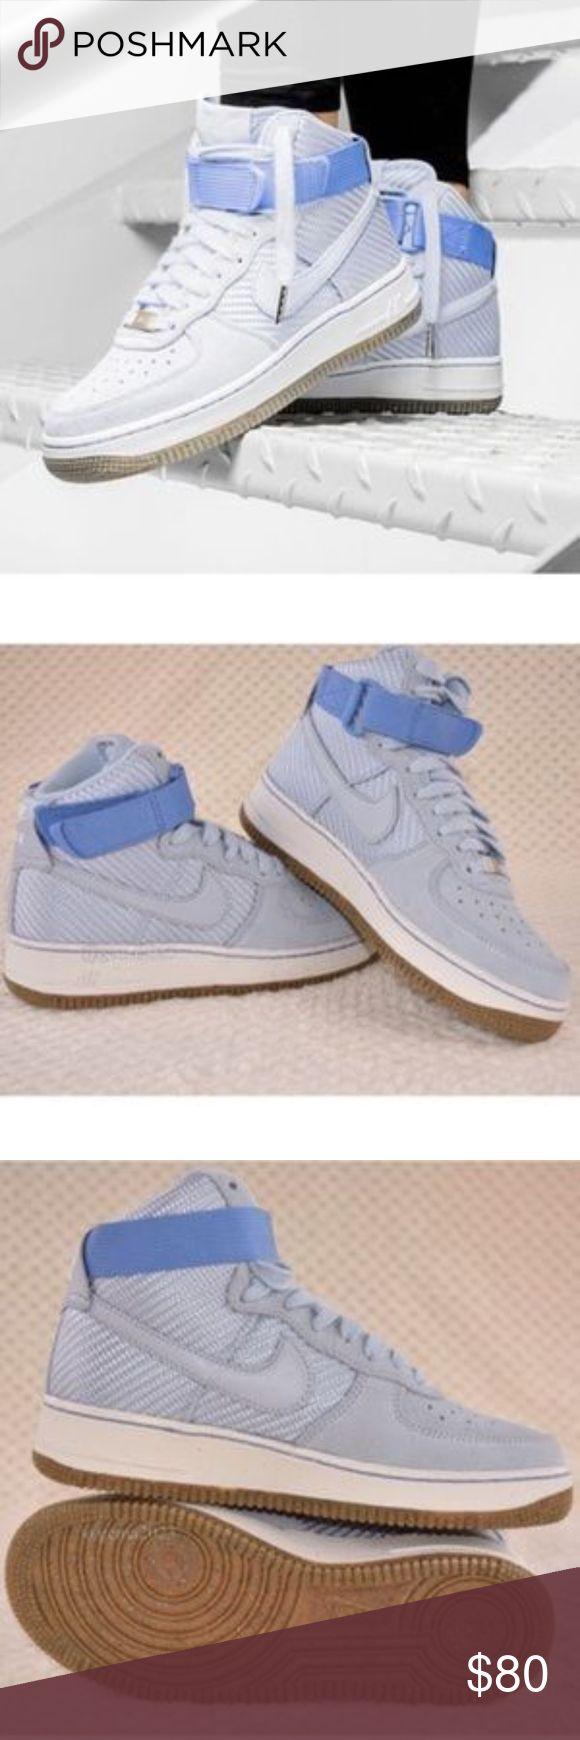 NEW! Nike Air Force 1 High PRM WMNS Nike WMNS Air Force 1